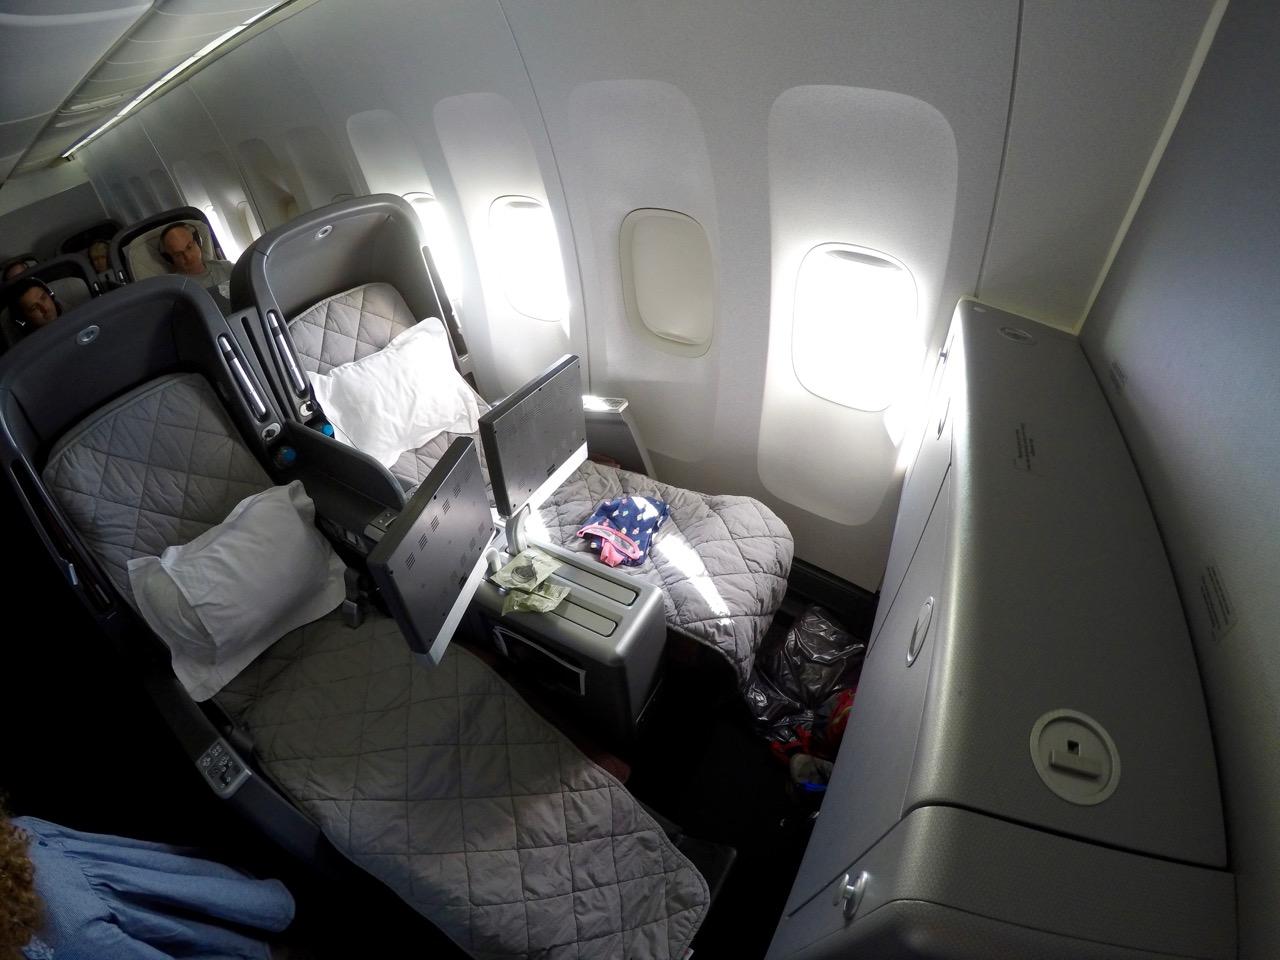 Qantas 747 Business Class seat